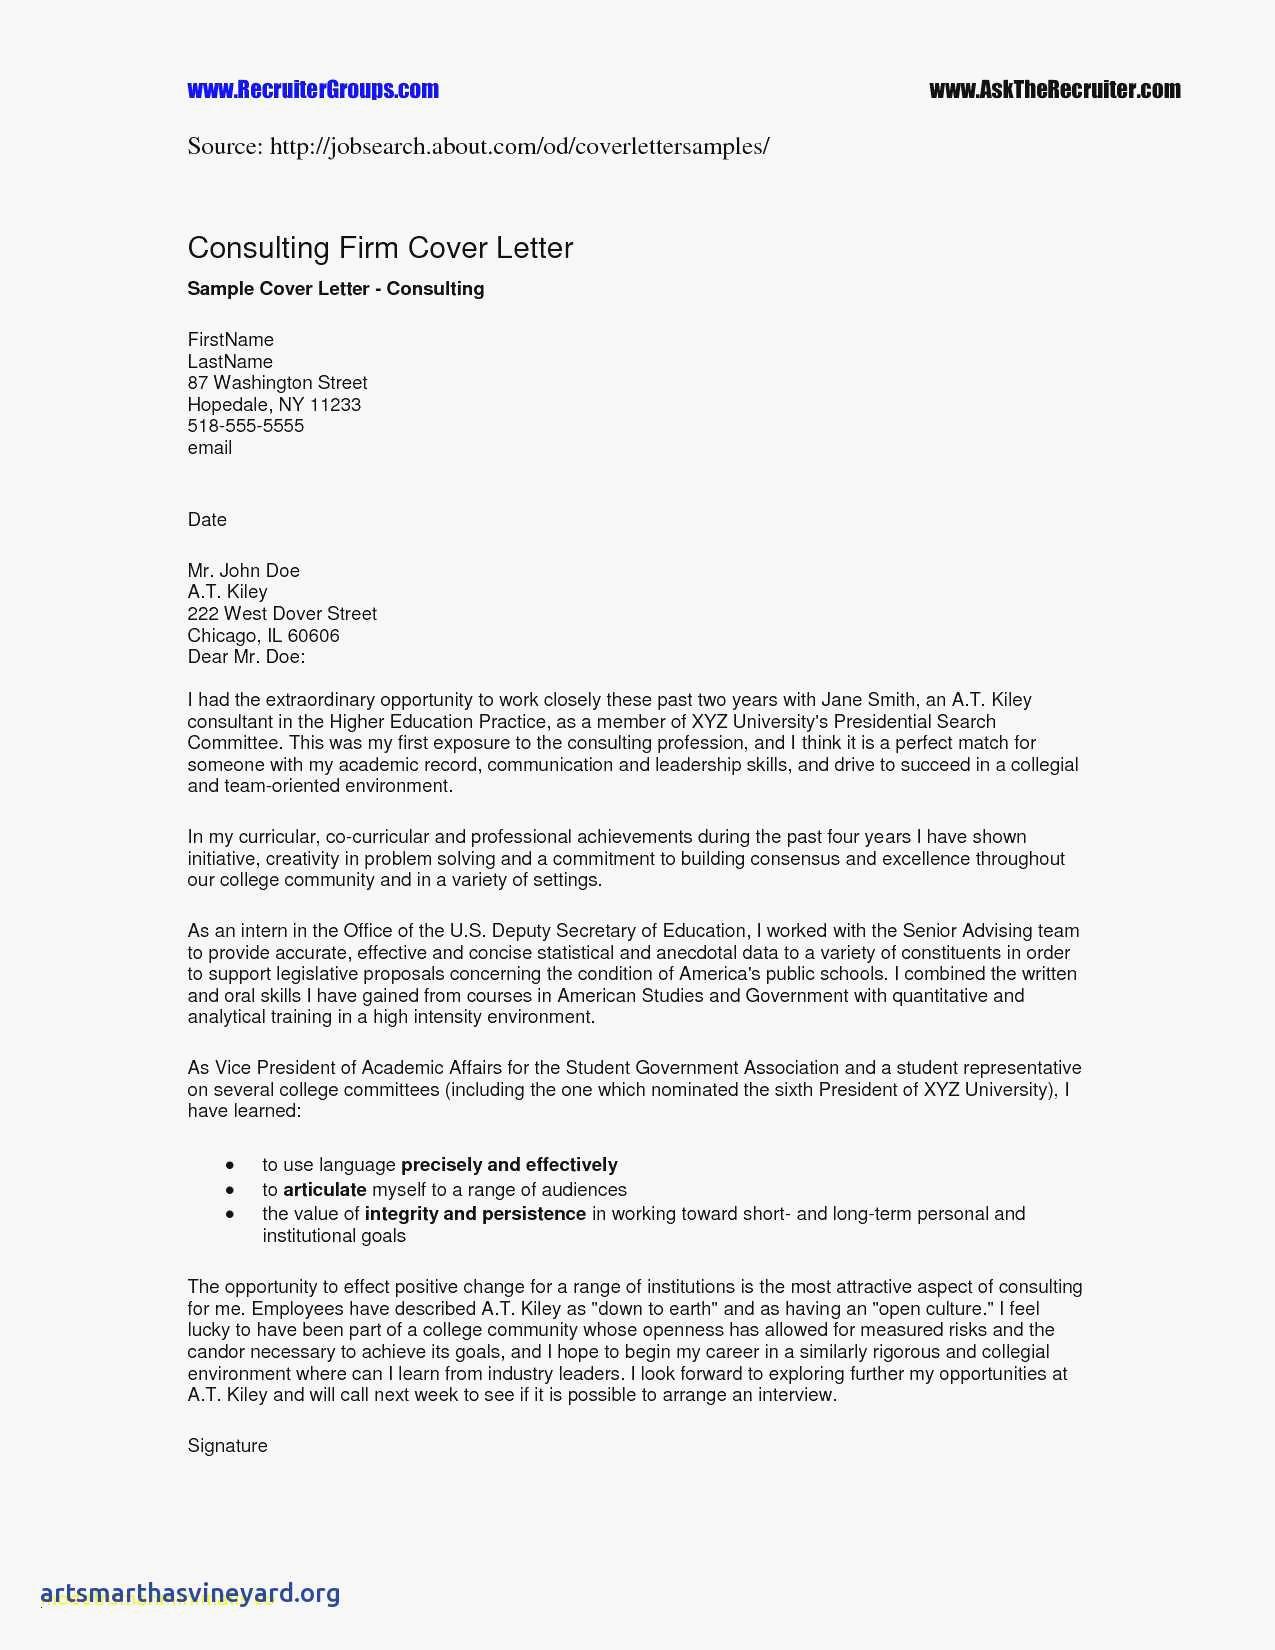 open office letter template example-Openoffice Vorlage Lebenslauf Neu Openoffice Datenbank Vorlagen Schön Lebenslauf Muster Download Open fice 18-i